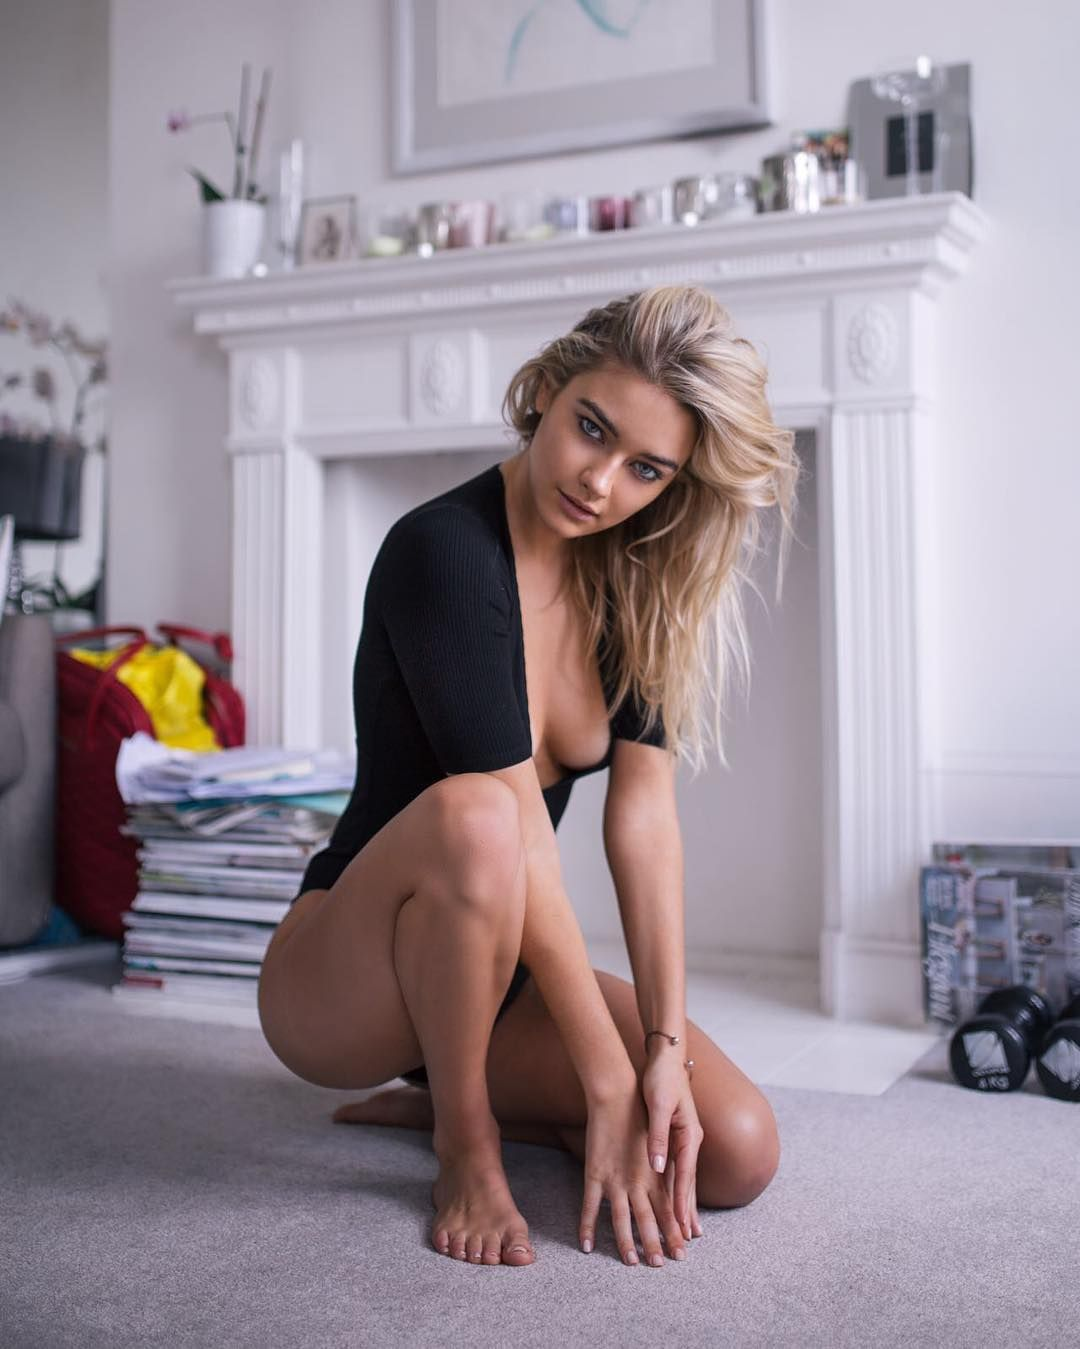 Selfie Tess Jantschek nudes (76 foto and video), Tits, Leaked, Twitter, swimsuit 2015